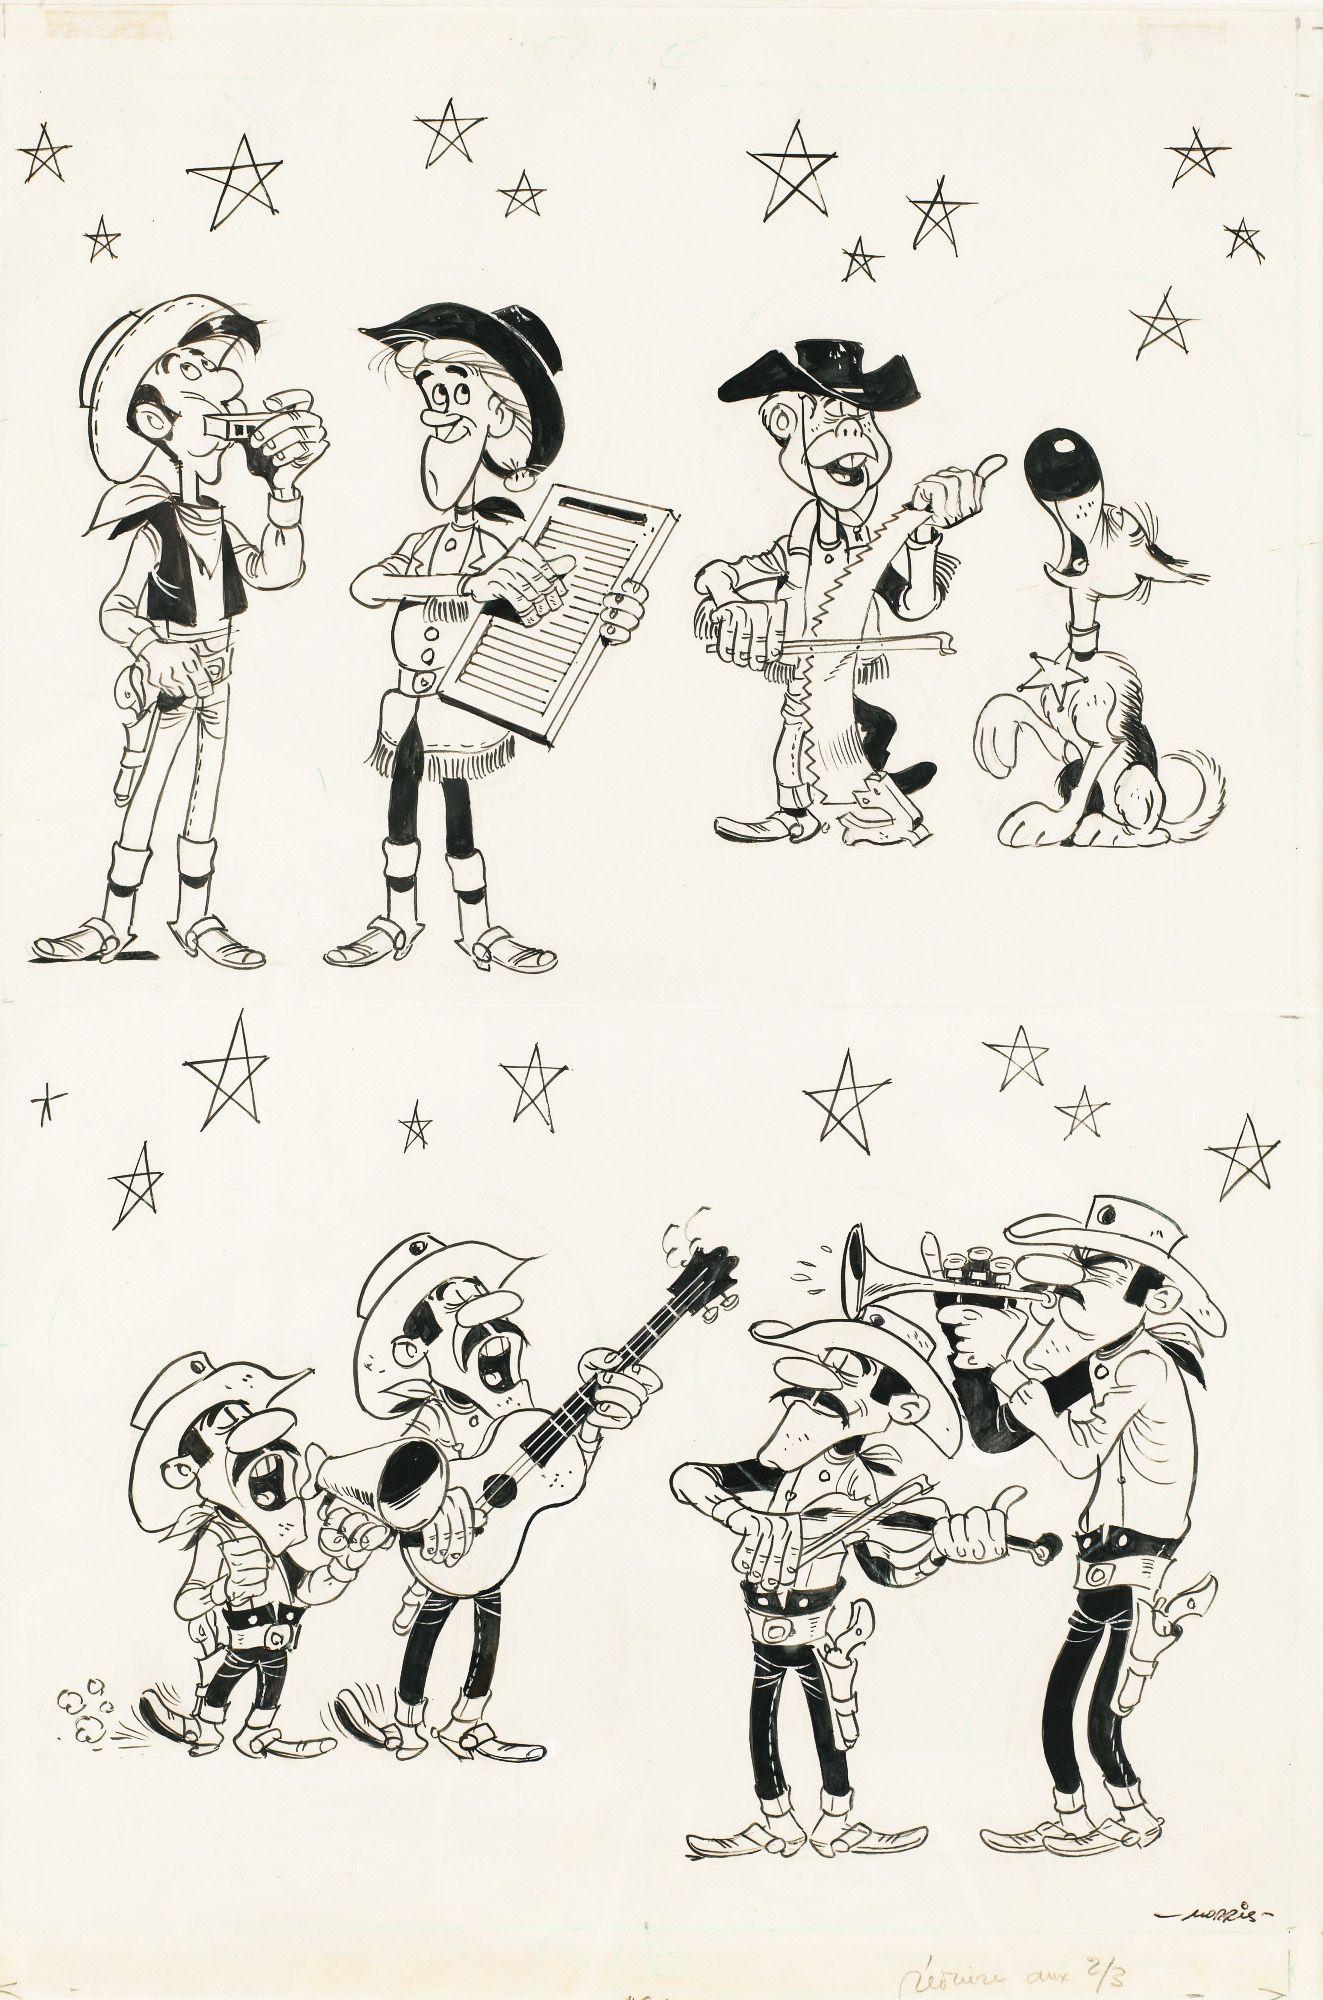 Lucky Luke, Les Dalton, Calamity Jane, Billy The Kid Et concernant Coloriage Lucky Luke A Imprimer Gratuit